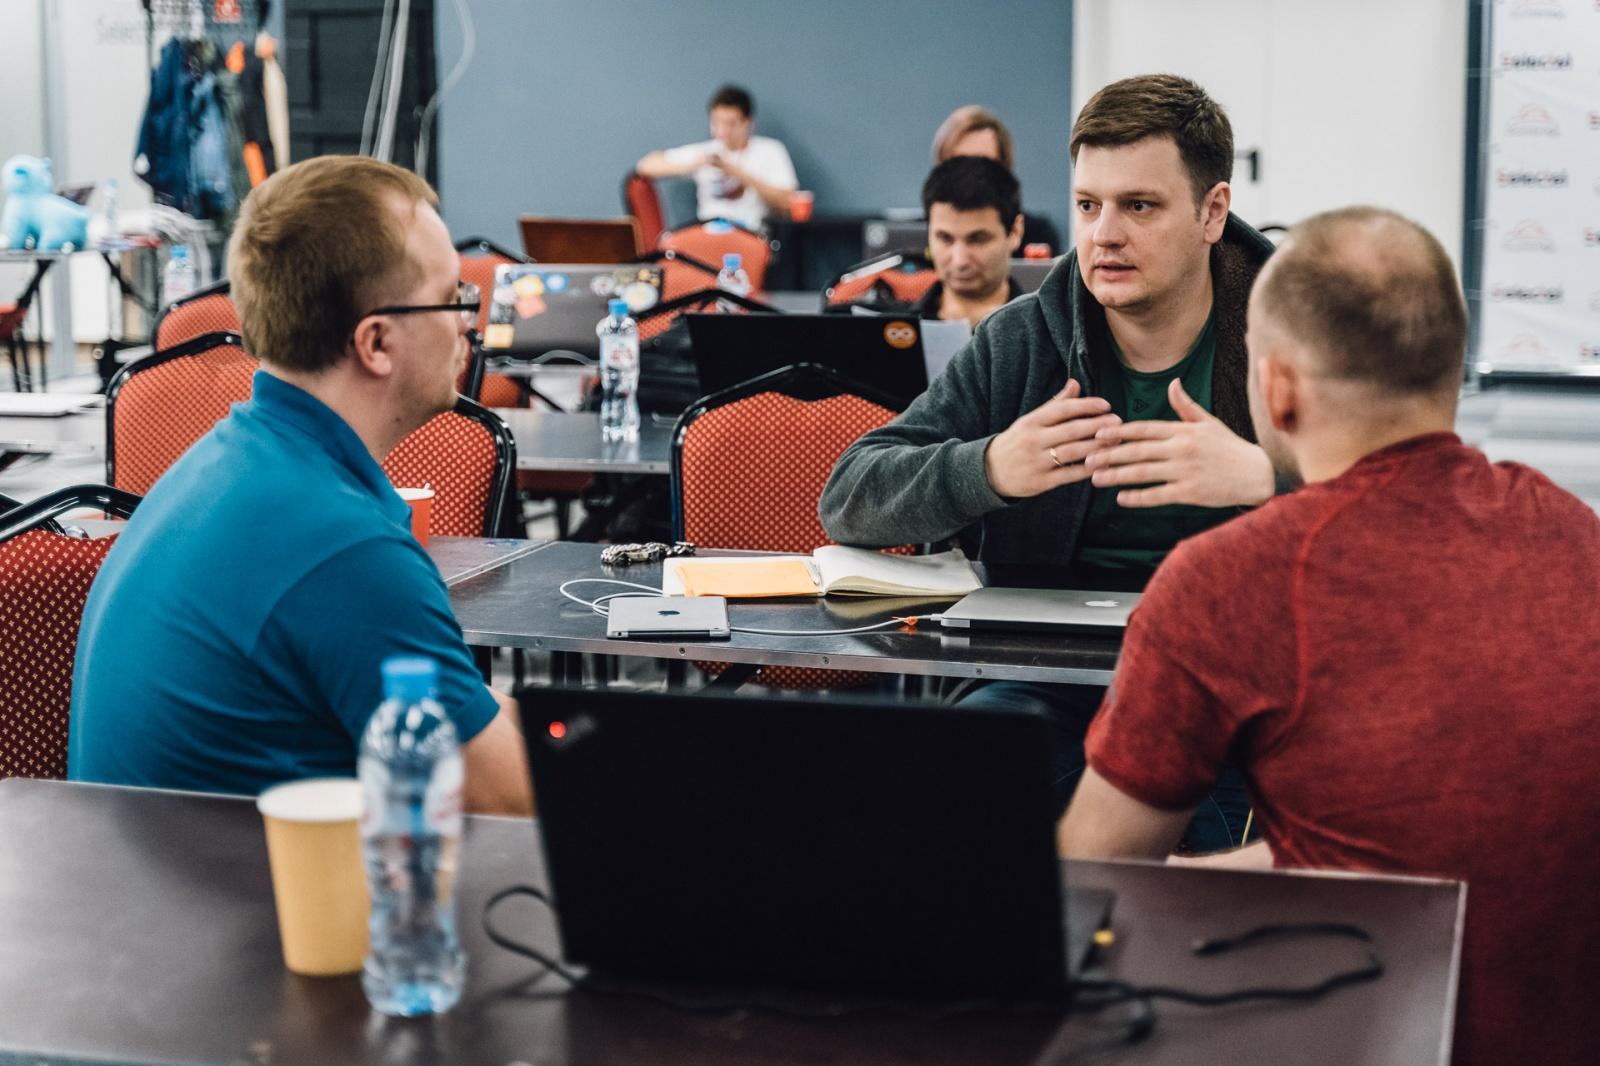 Артём Галонский, СТО БюроБюро: «Я против такого понятия, как DevOps-инженер» - 2